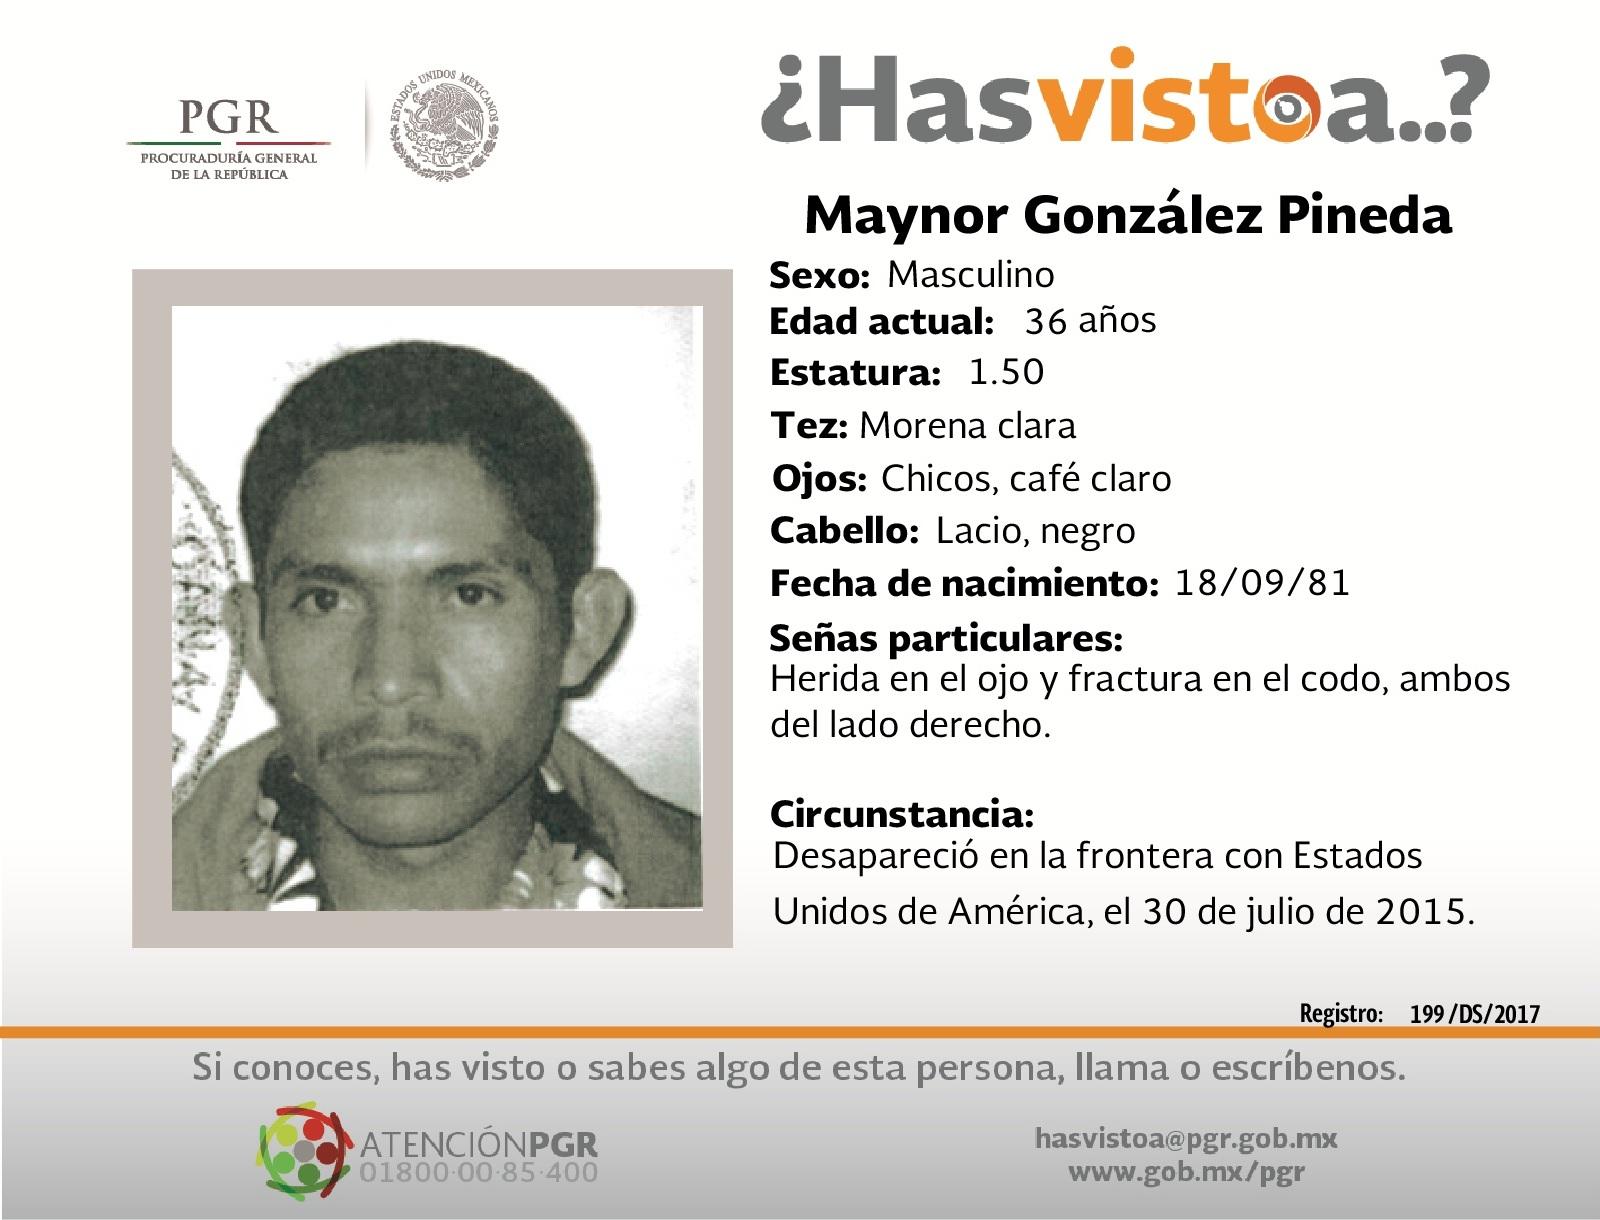 Ayúdanos a localizar a Maynor González